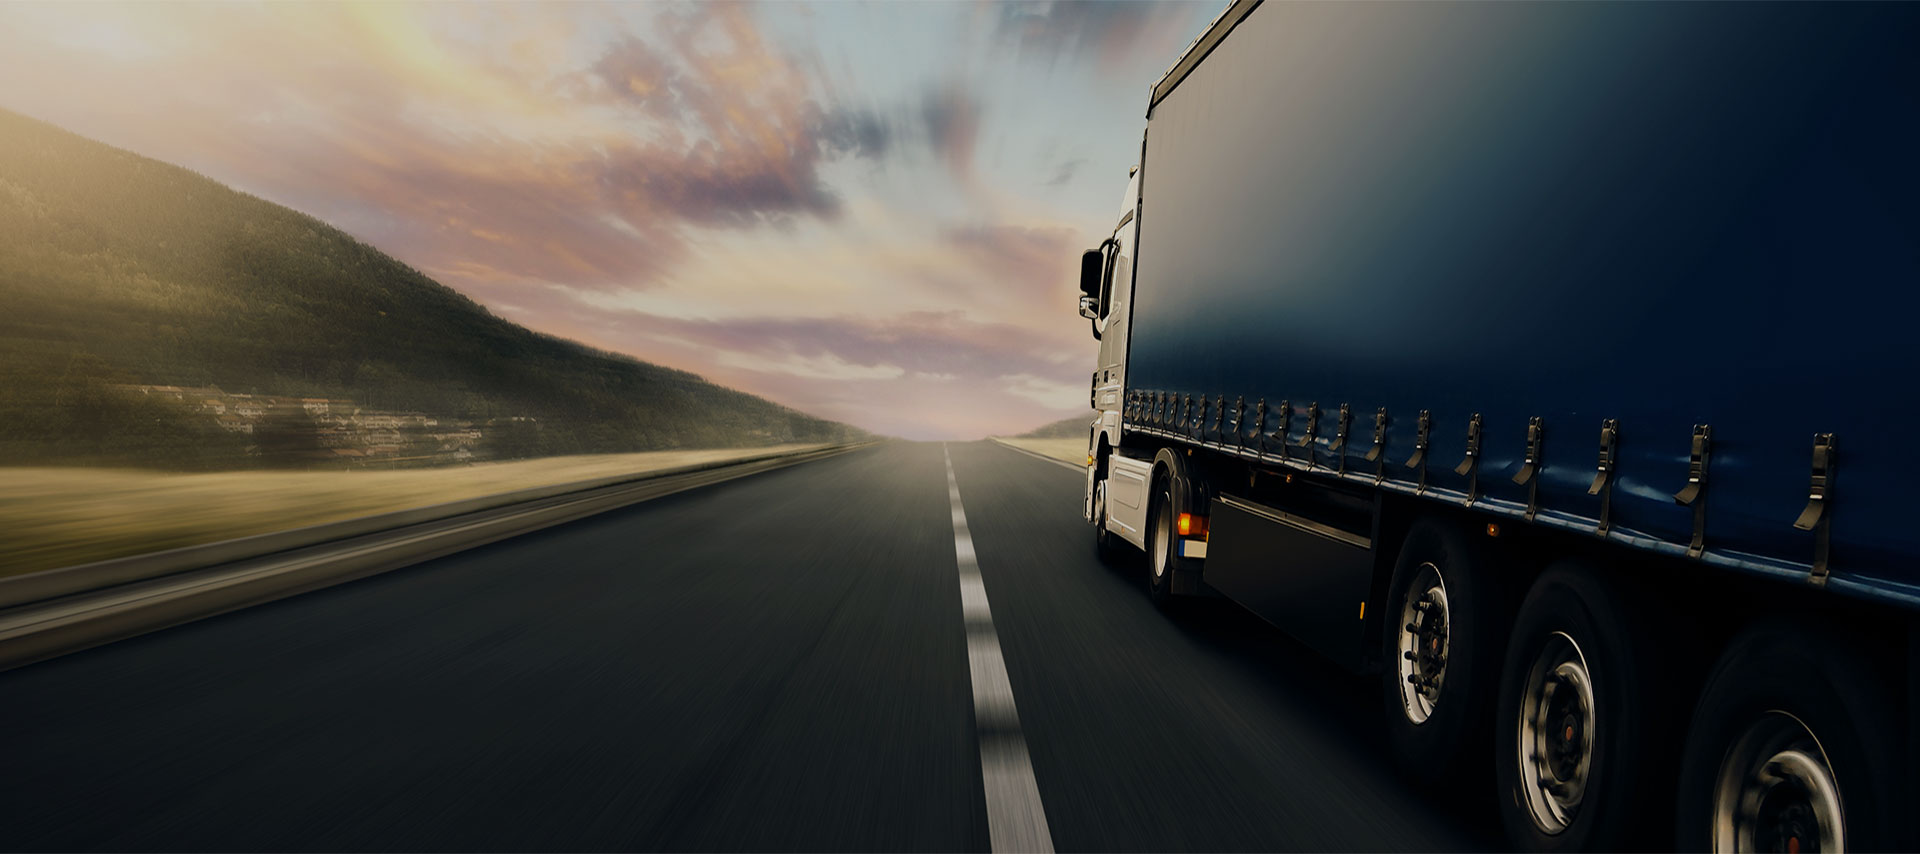 trucking transportation and logistics website template